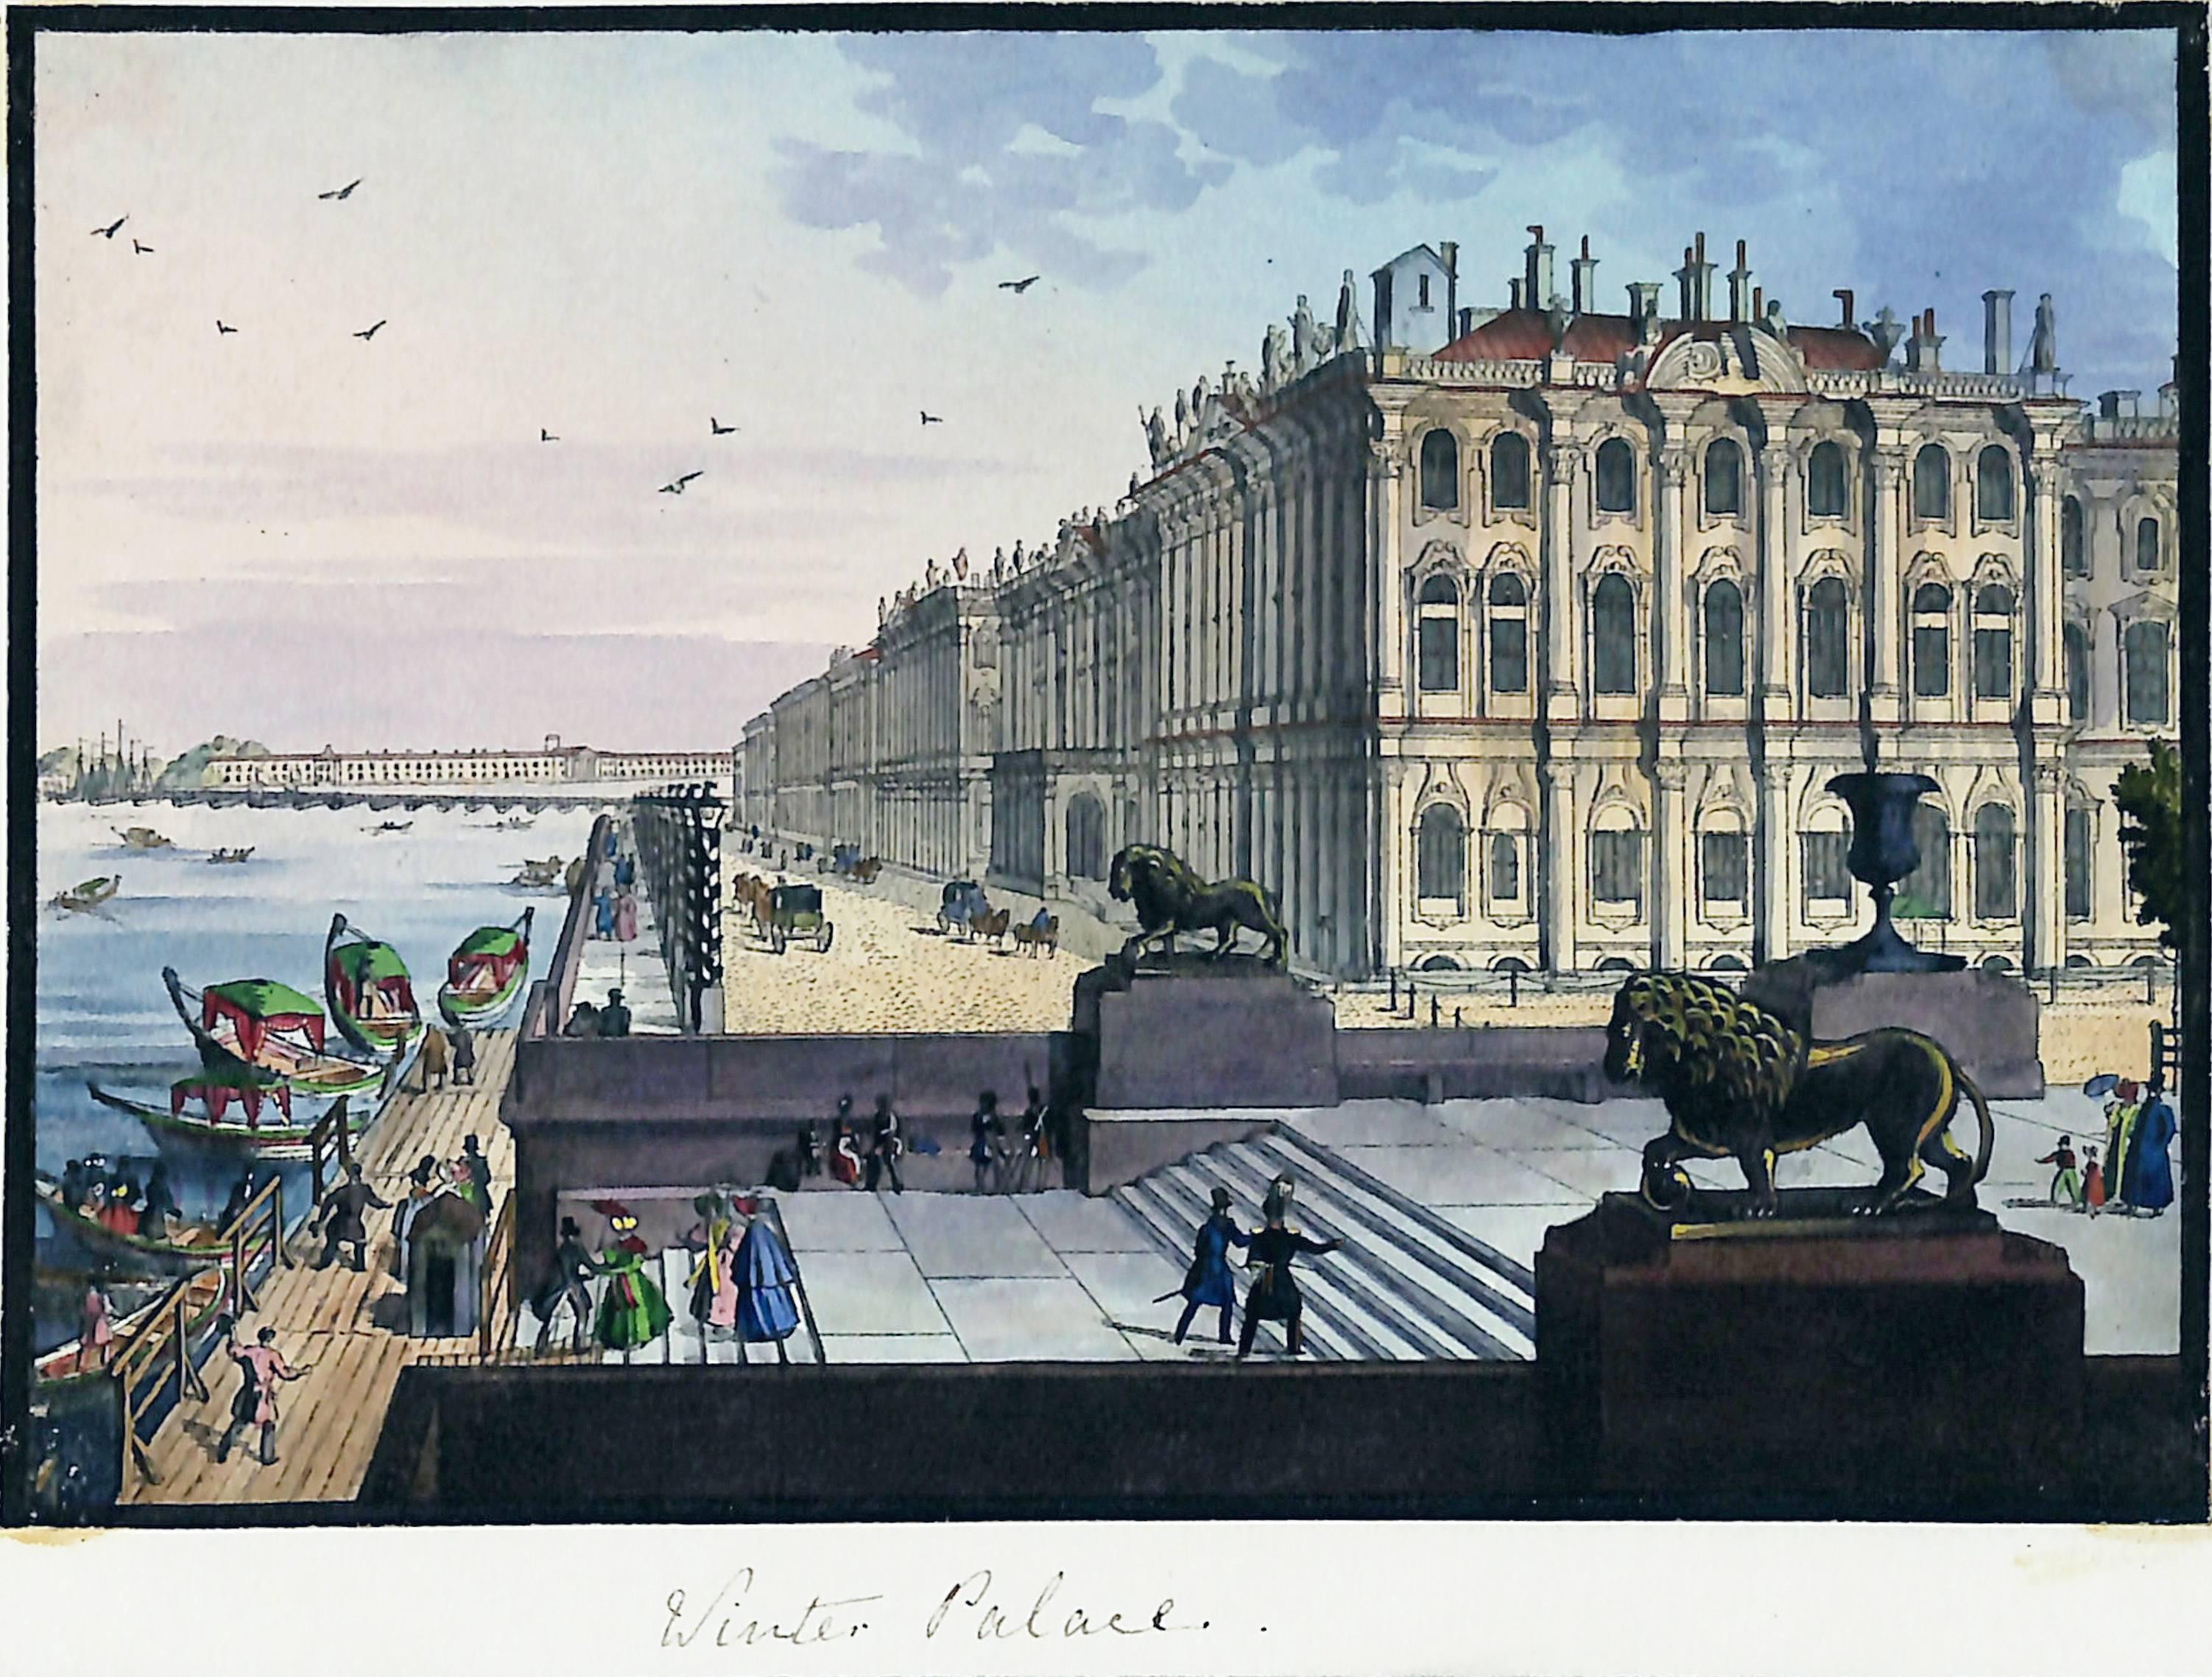 Санкт-Петербург, Зимний дворец, 1837 год. Неизвестный художник